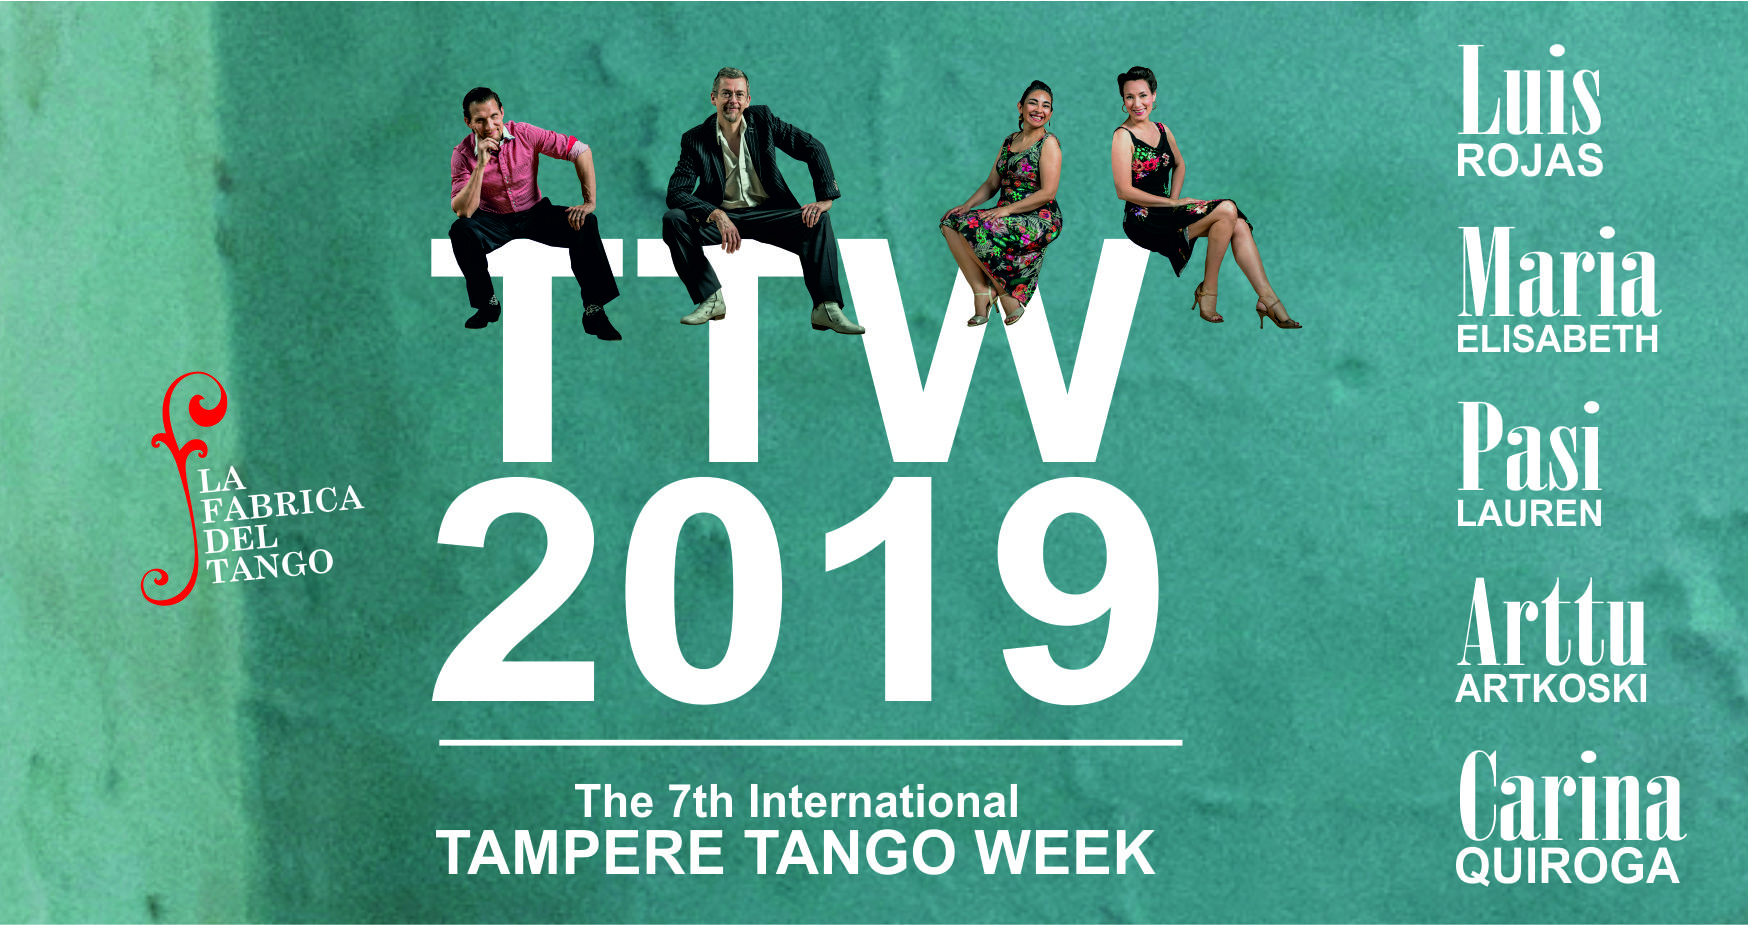 La T4 tango workshop